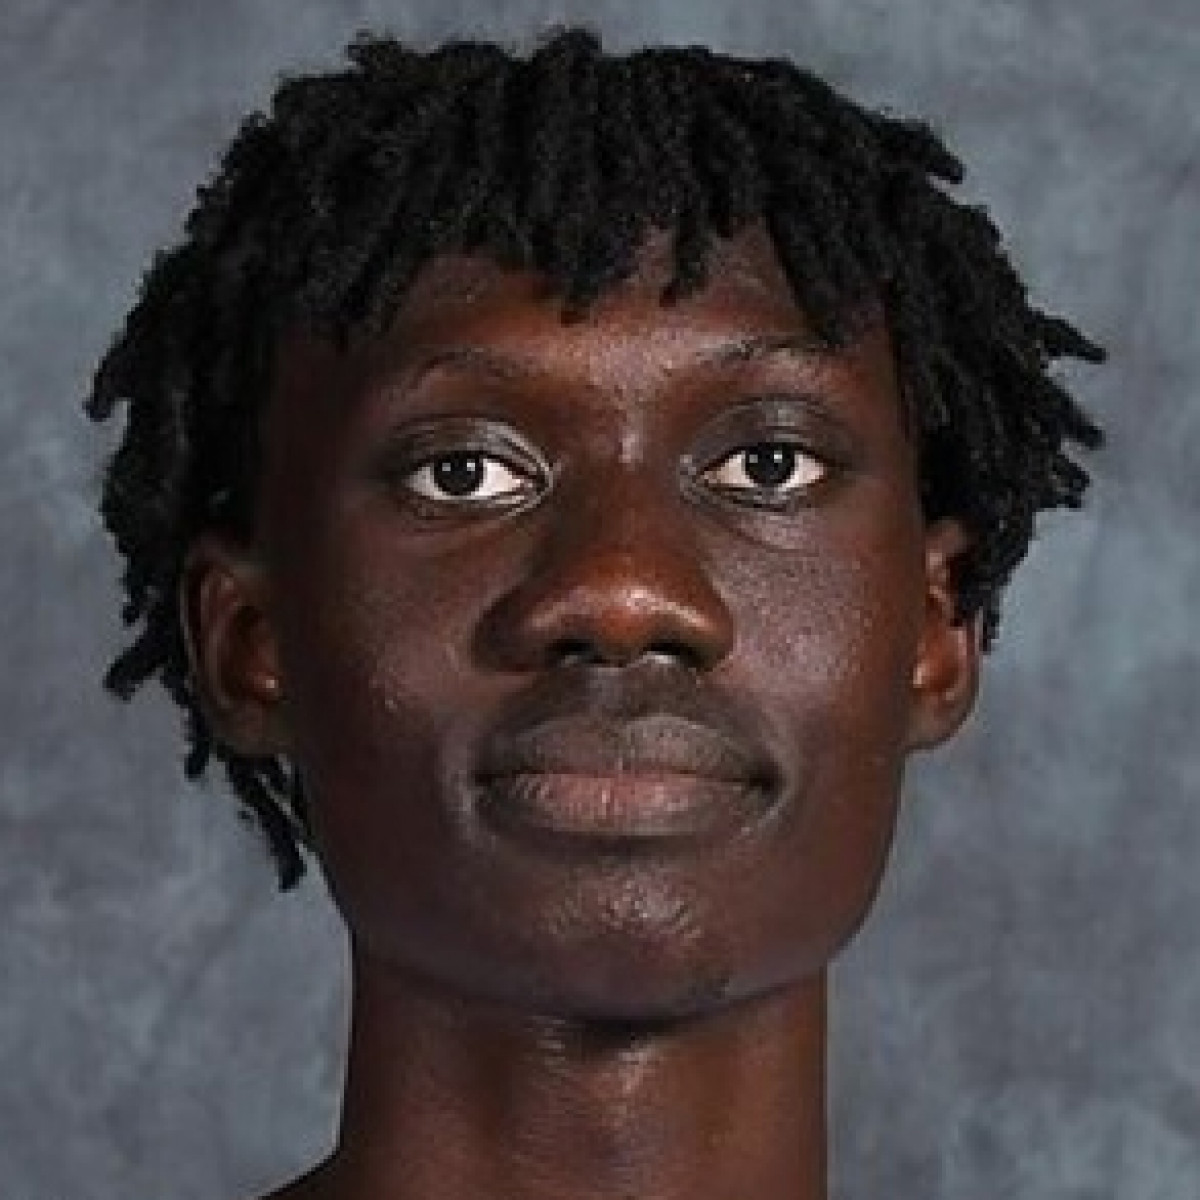 Mouhamadou Gueye